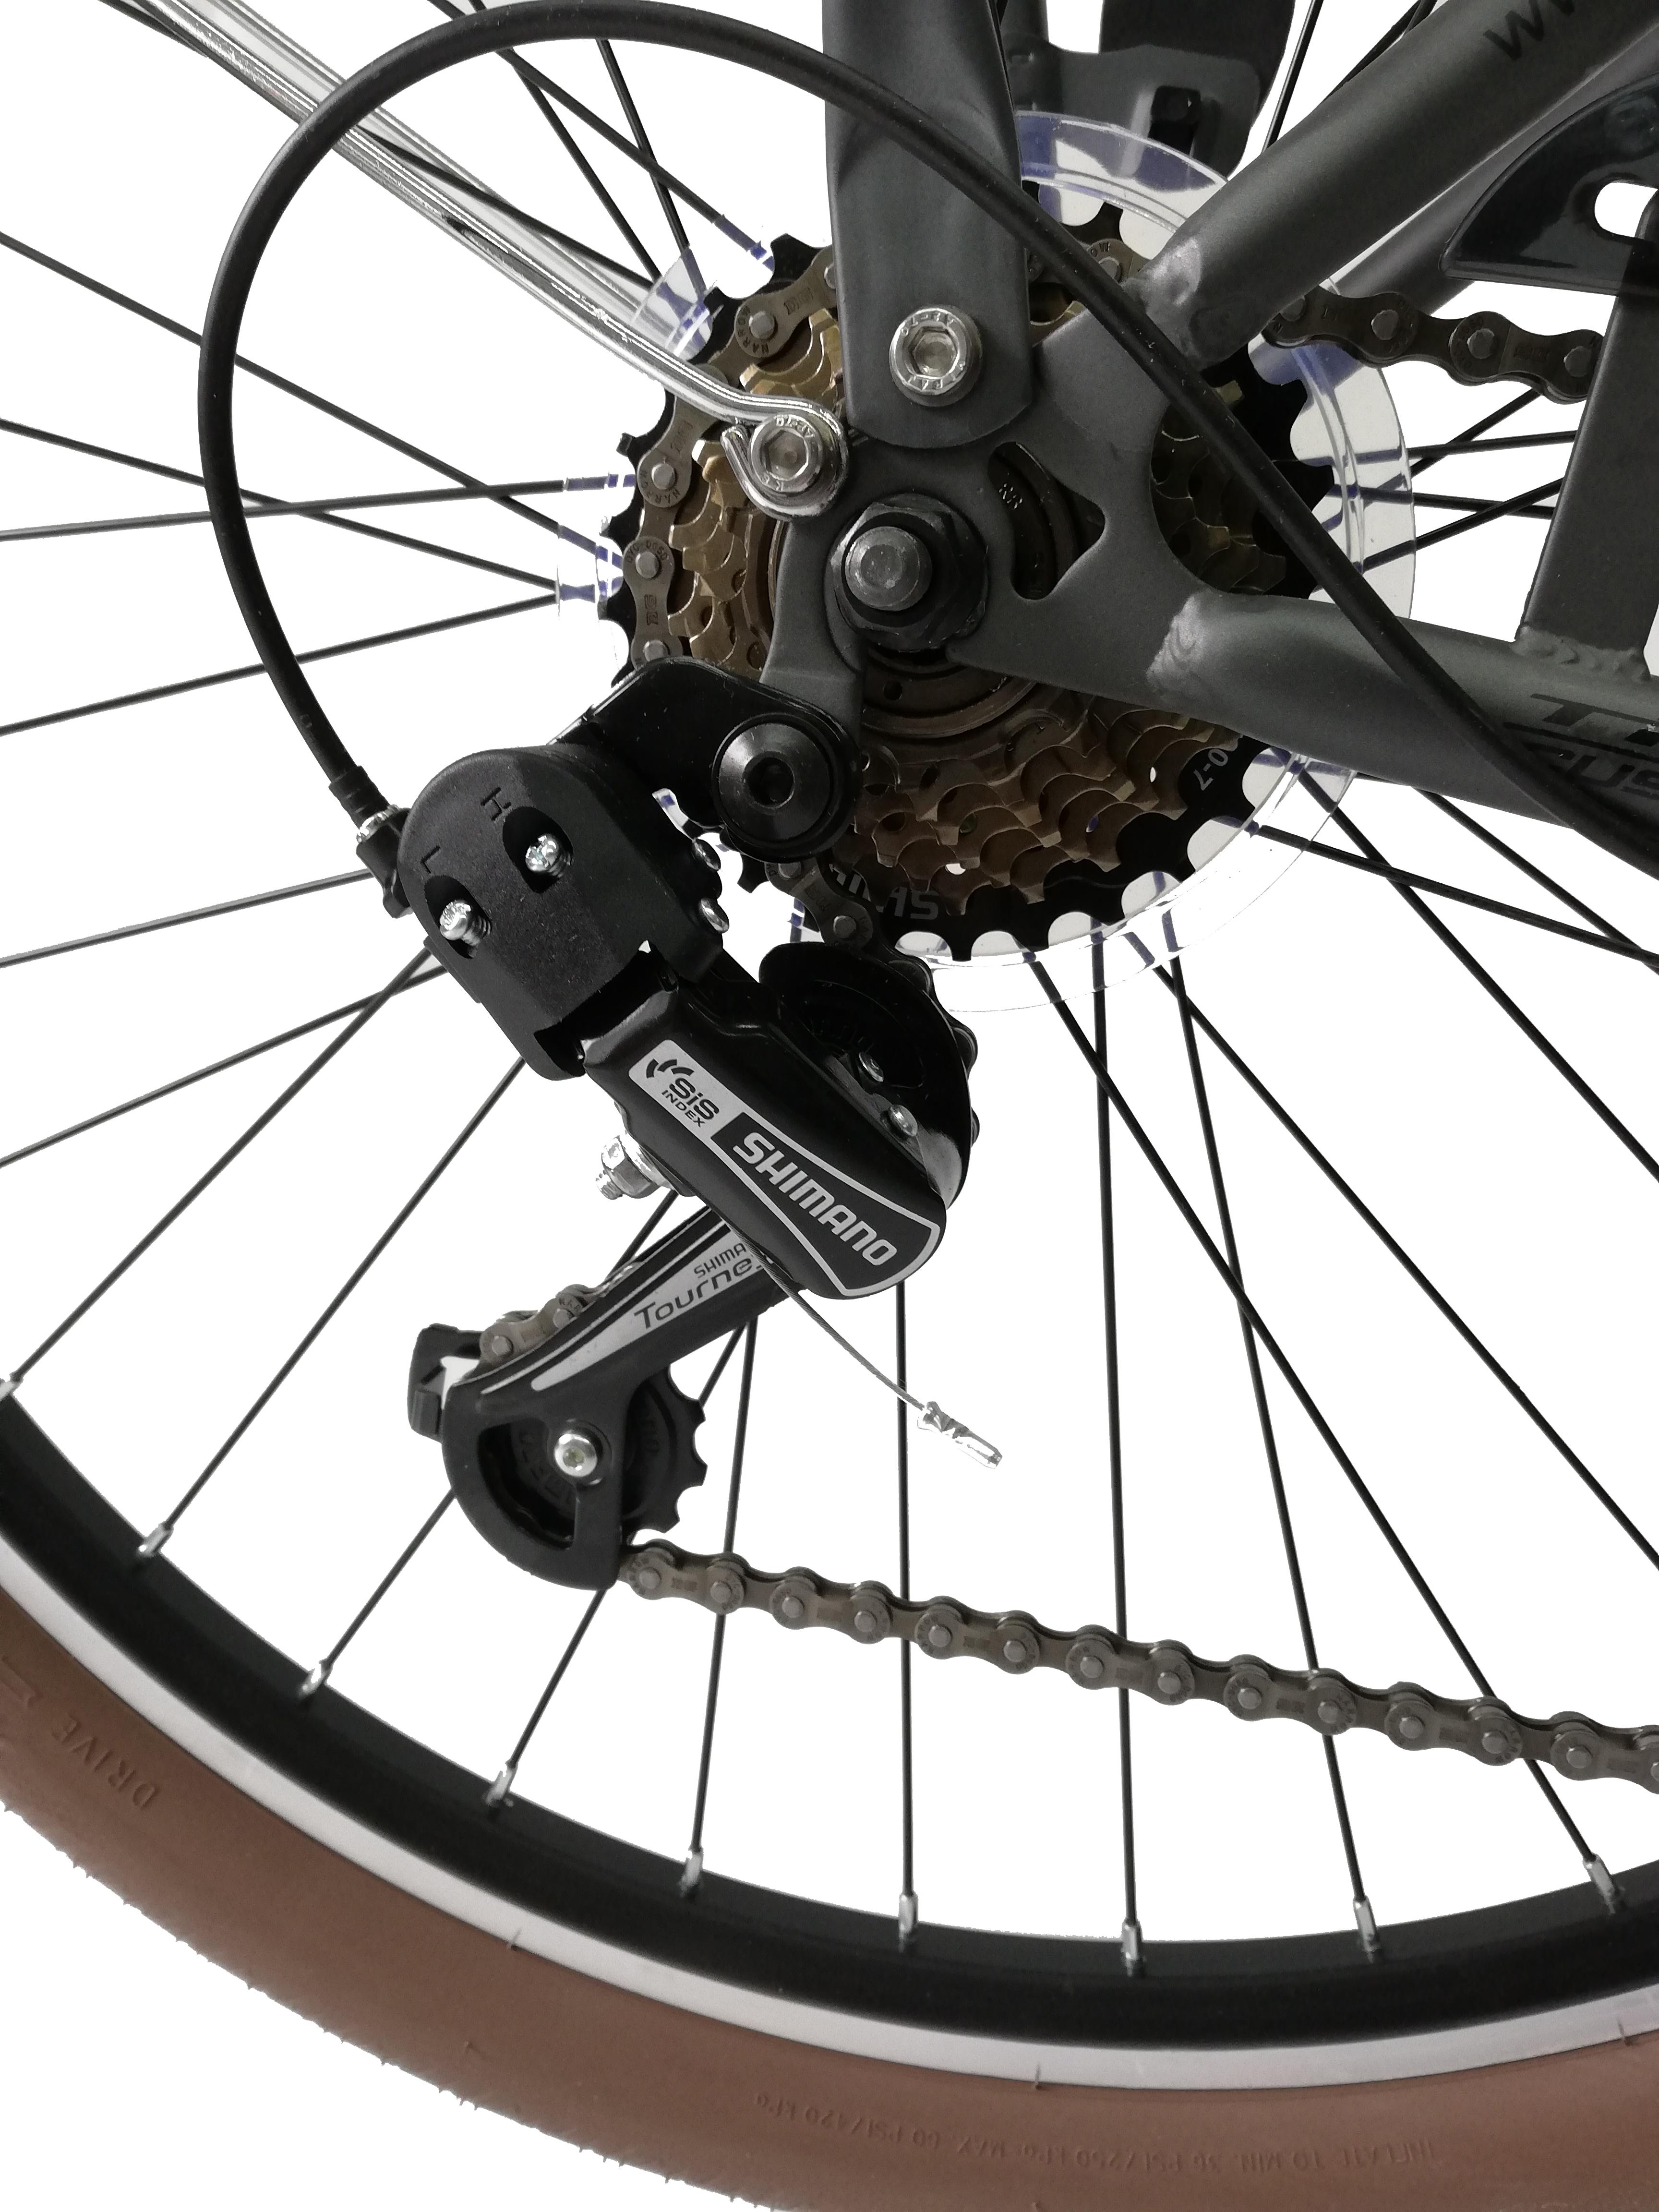 "Bicicleta City Umit Wagen Lady, Culoare Gri, Roata 26"" Otel [2]"